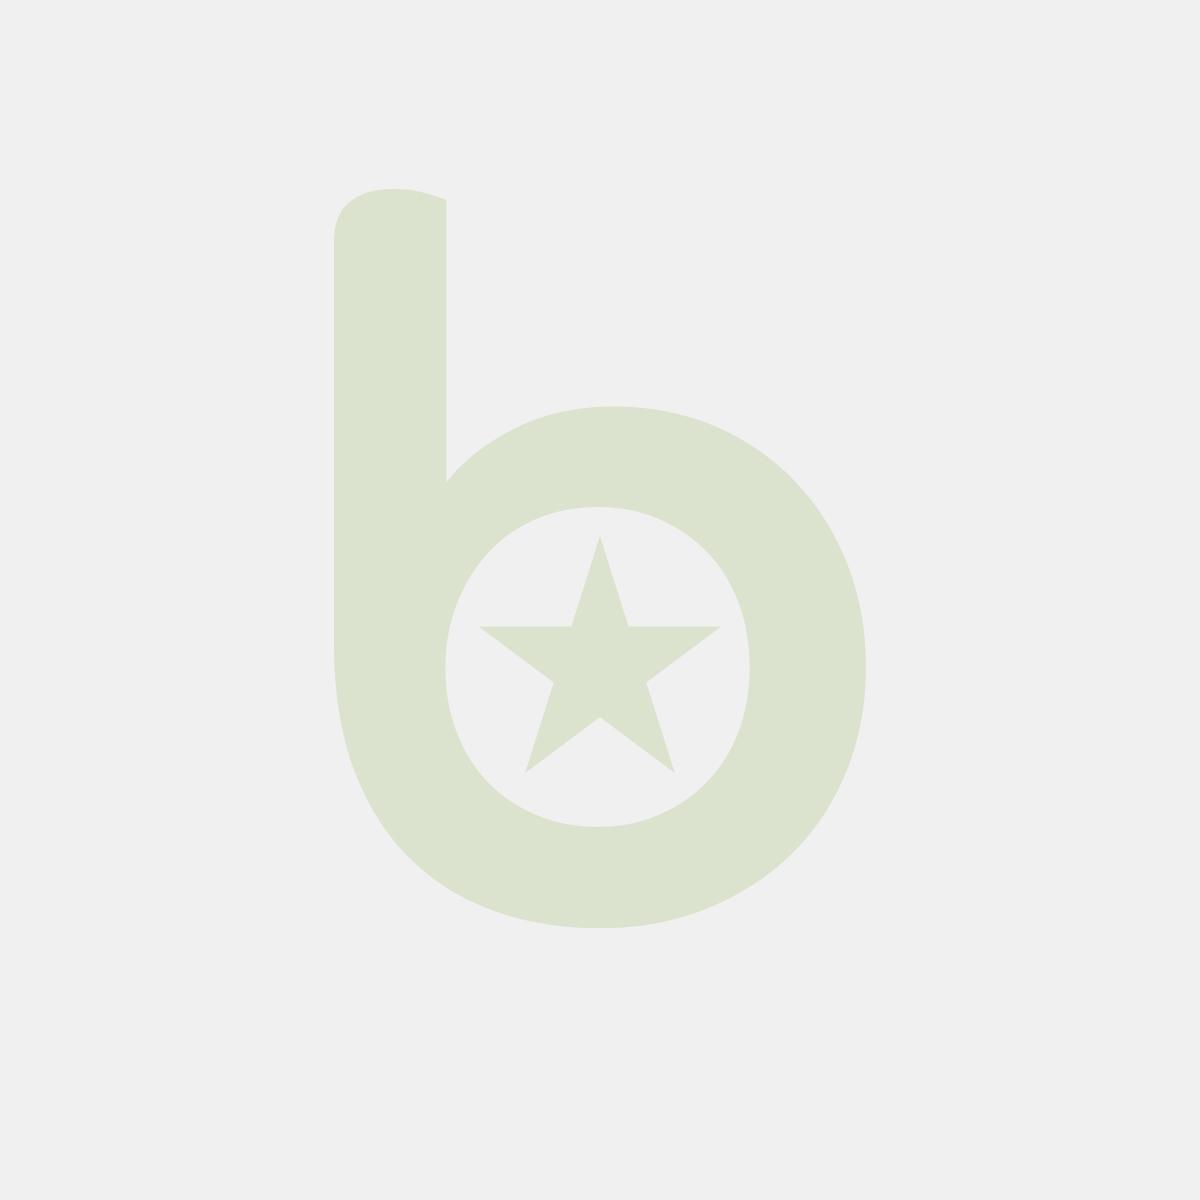 Schładzarka szokowa NANO 7x GN 1/1